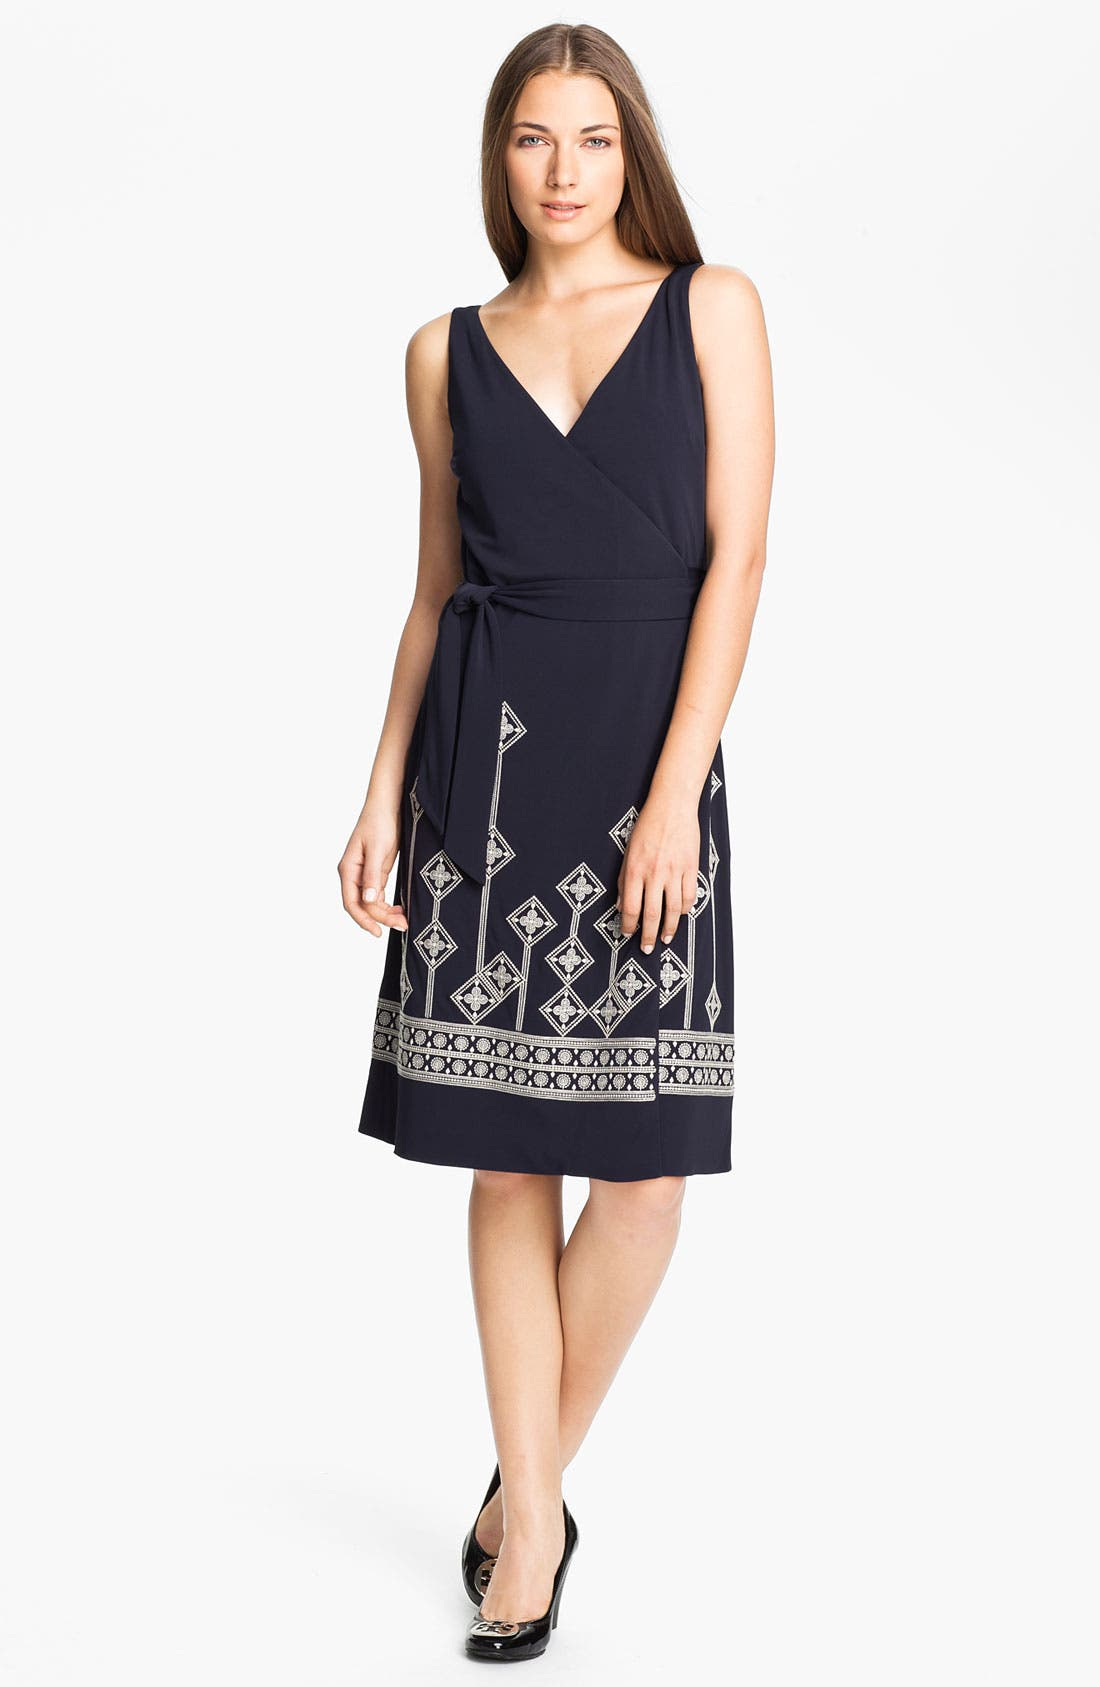 Main Image - Tory Burch 'Reena' Embroidered Wrap Dress